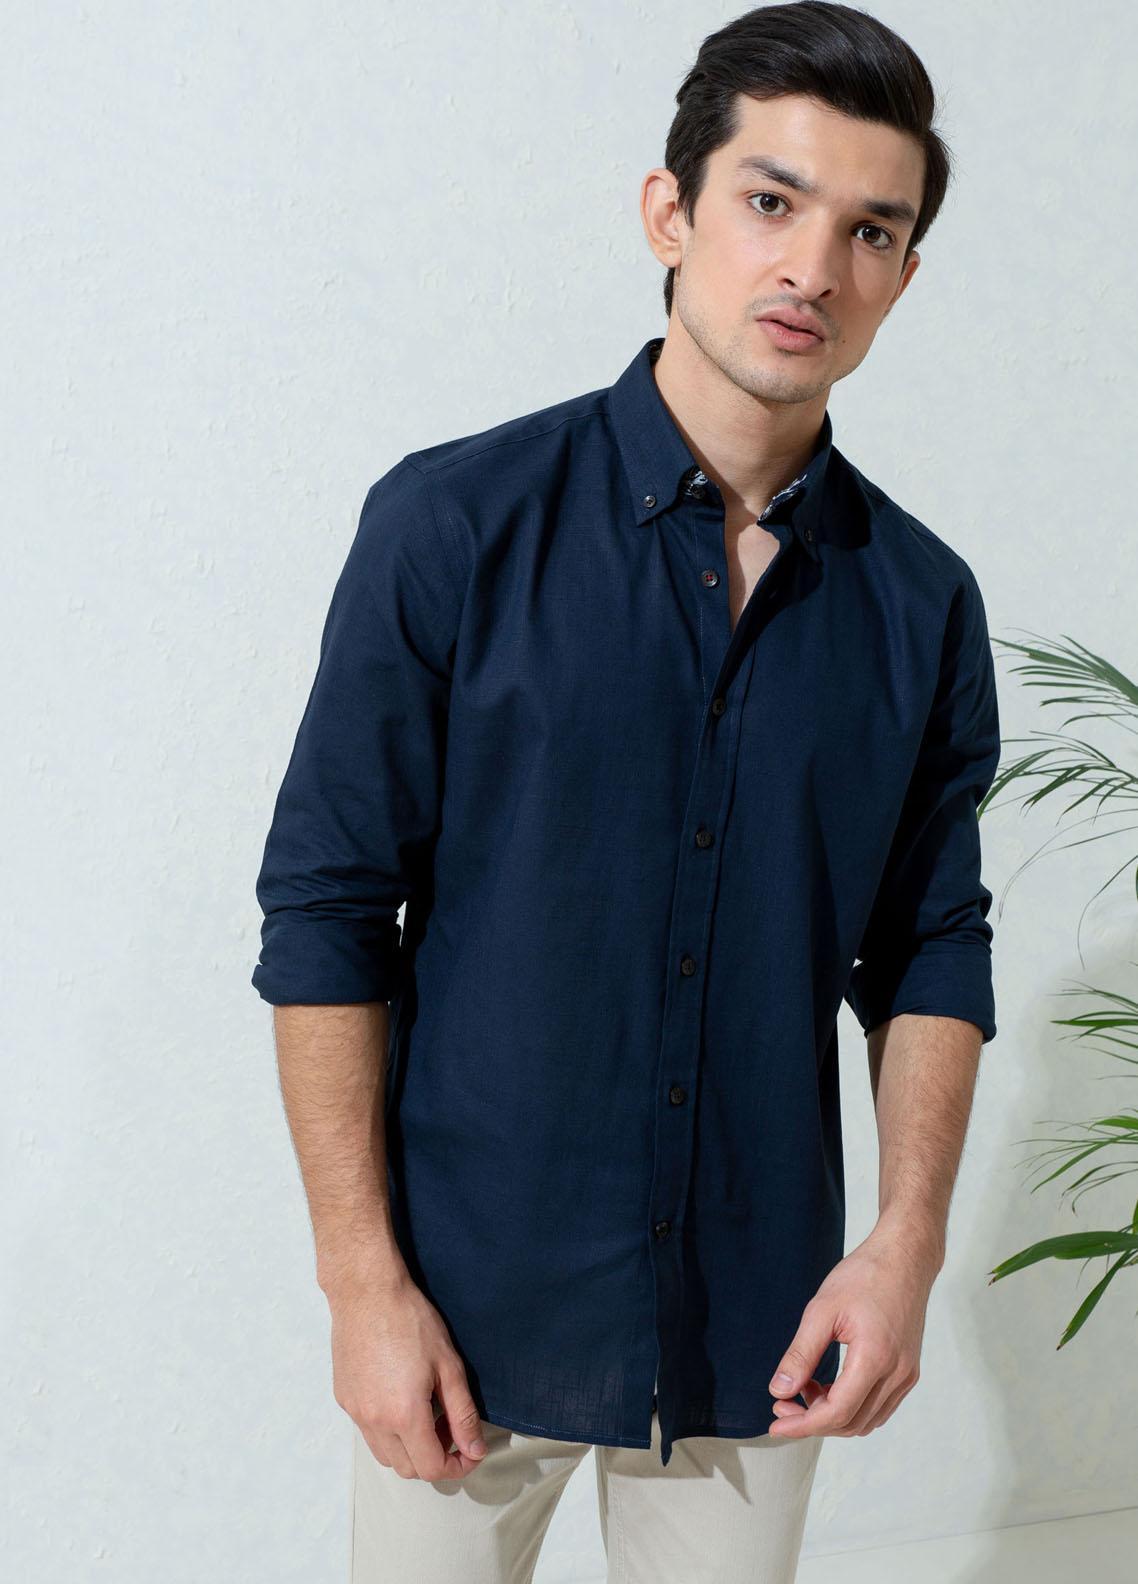 Brumano Cotton Full Sleeves Casual Shirts for Men -  BM21SH Navy Blue Slub Textured